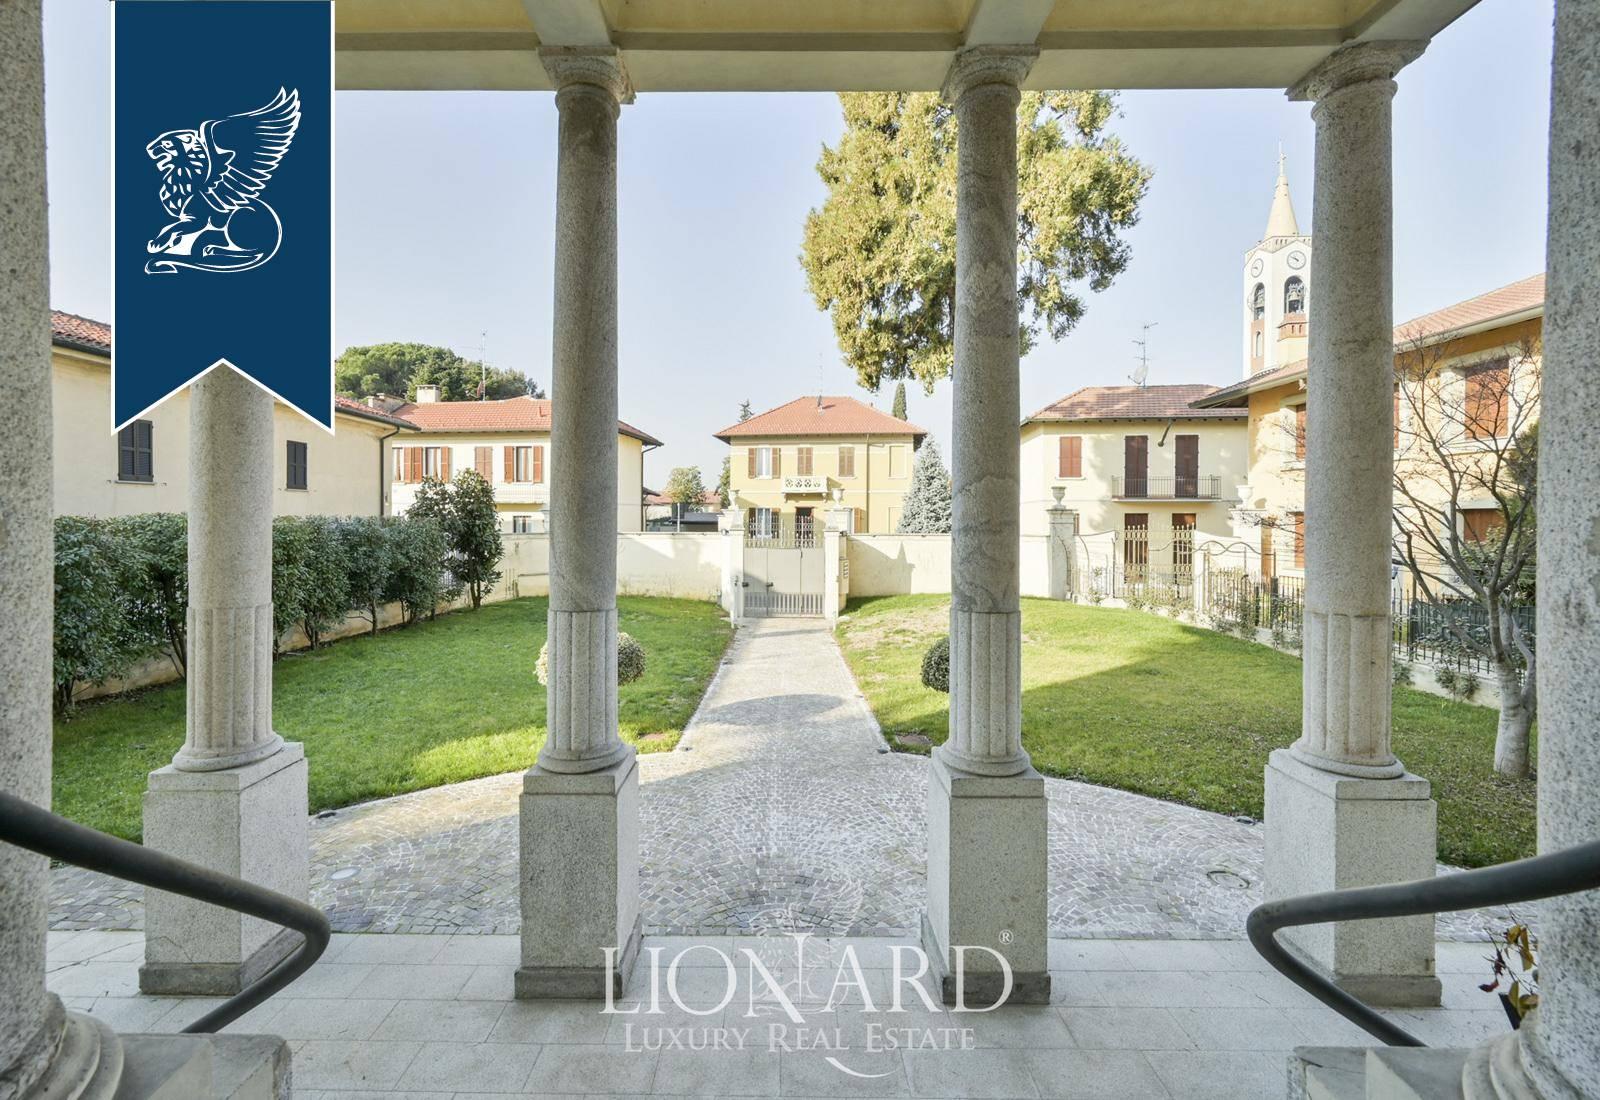 Villa in Vendita a Buscate: 0 locali, 890 mq - Foto 6